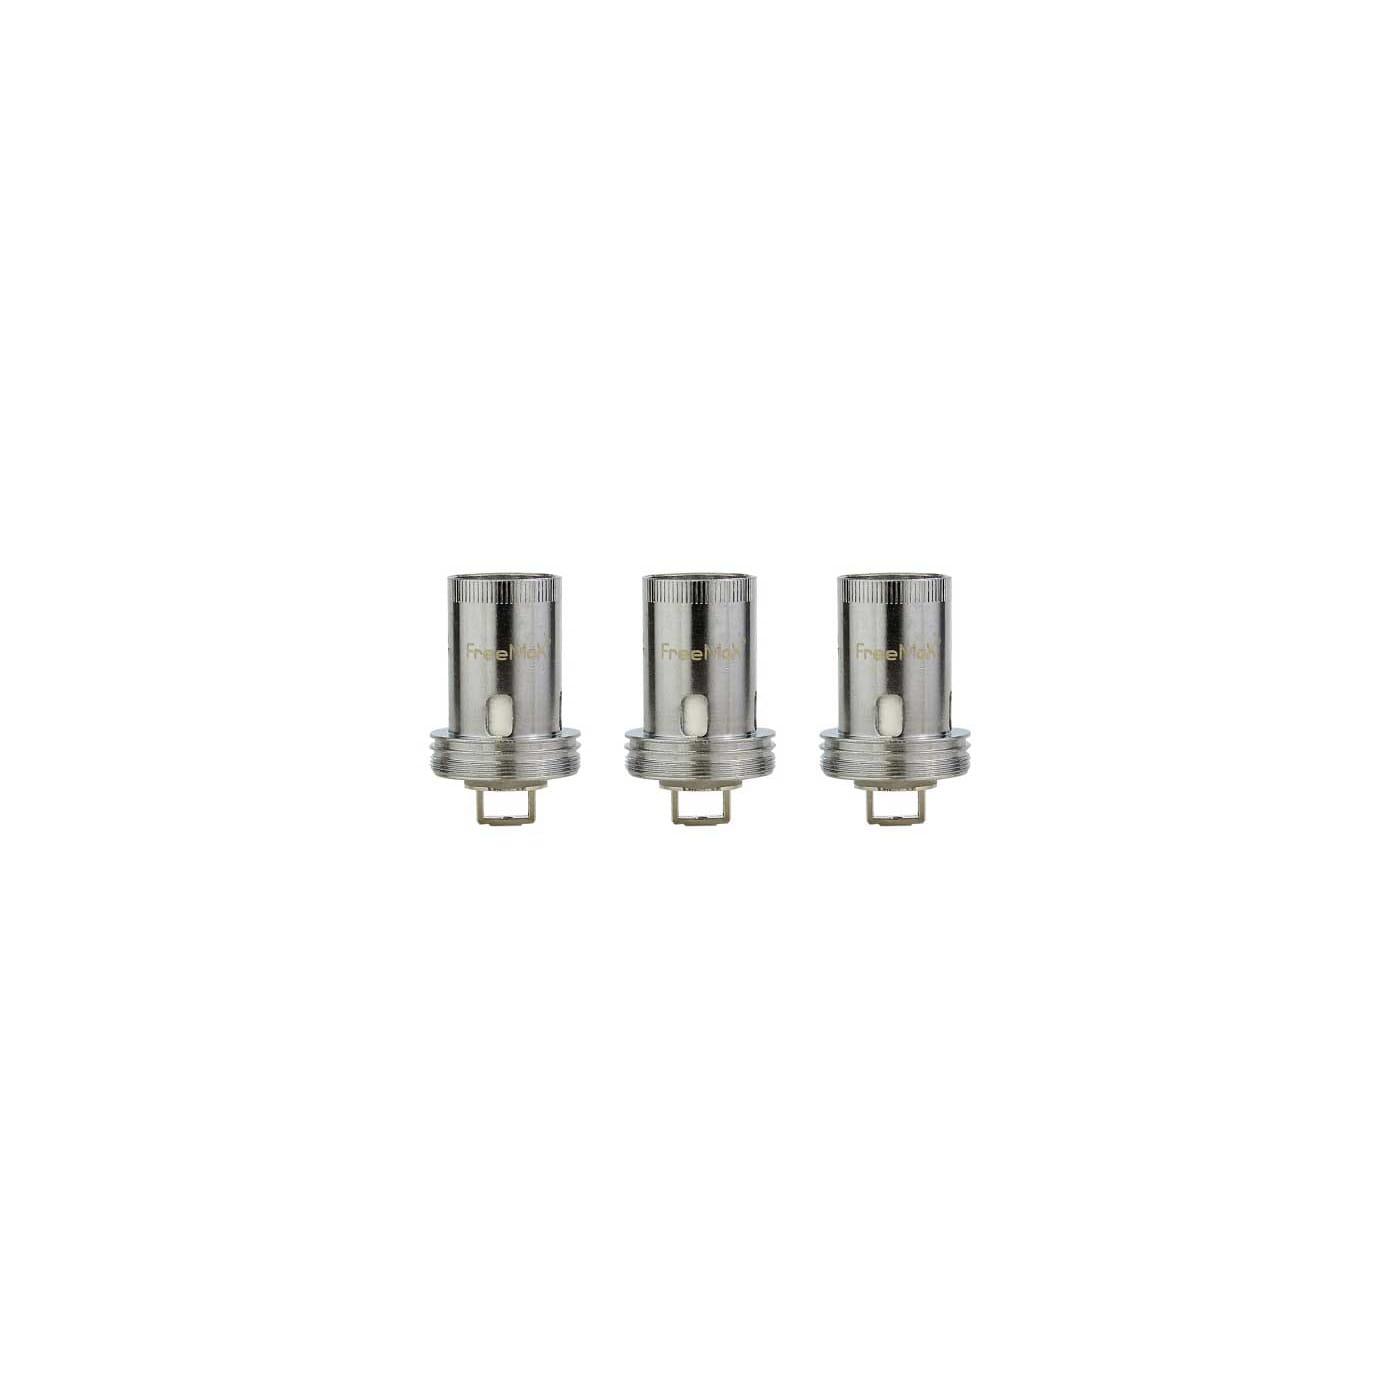 Freemax SS316L Single Mesh Coil - 3 pack